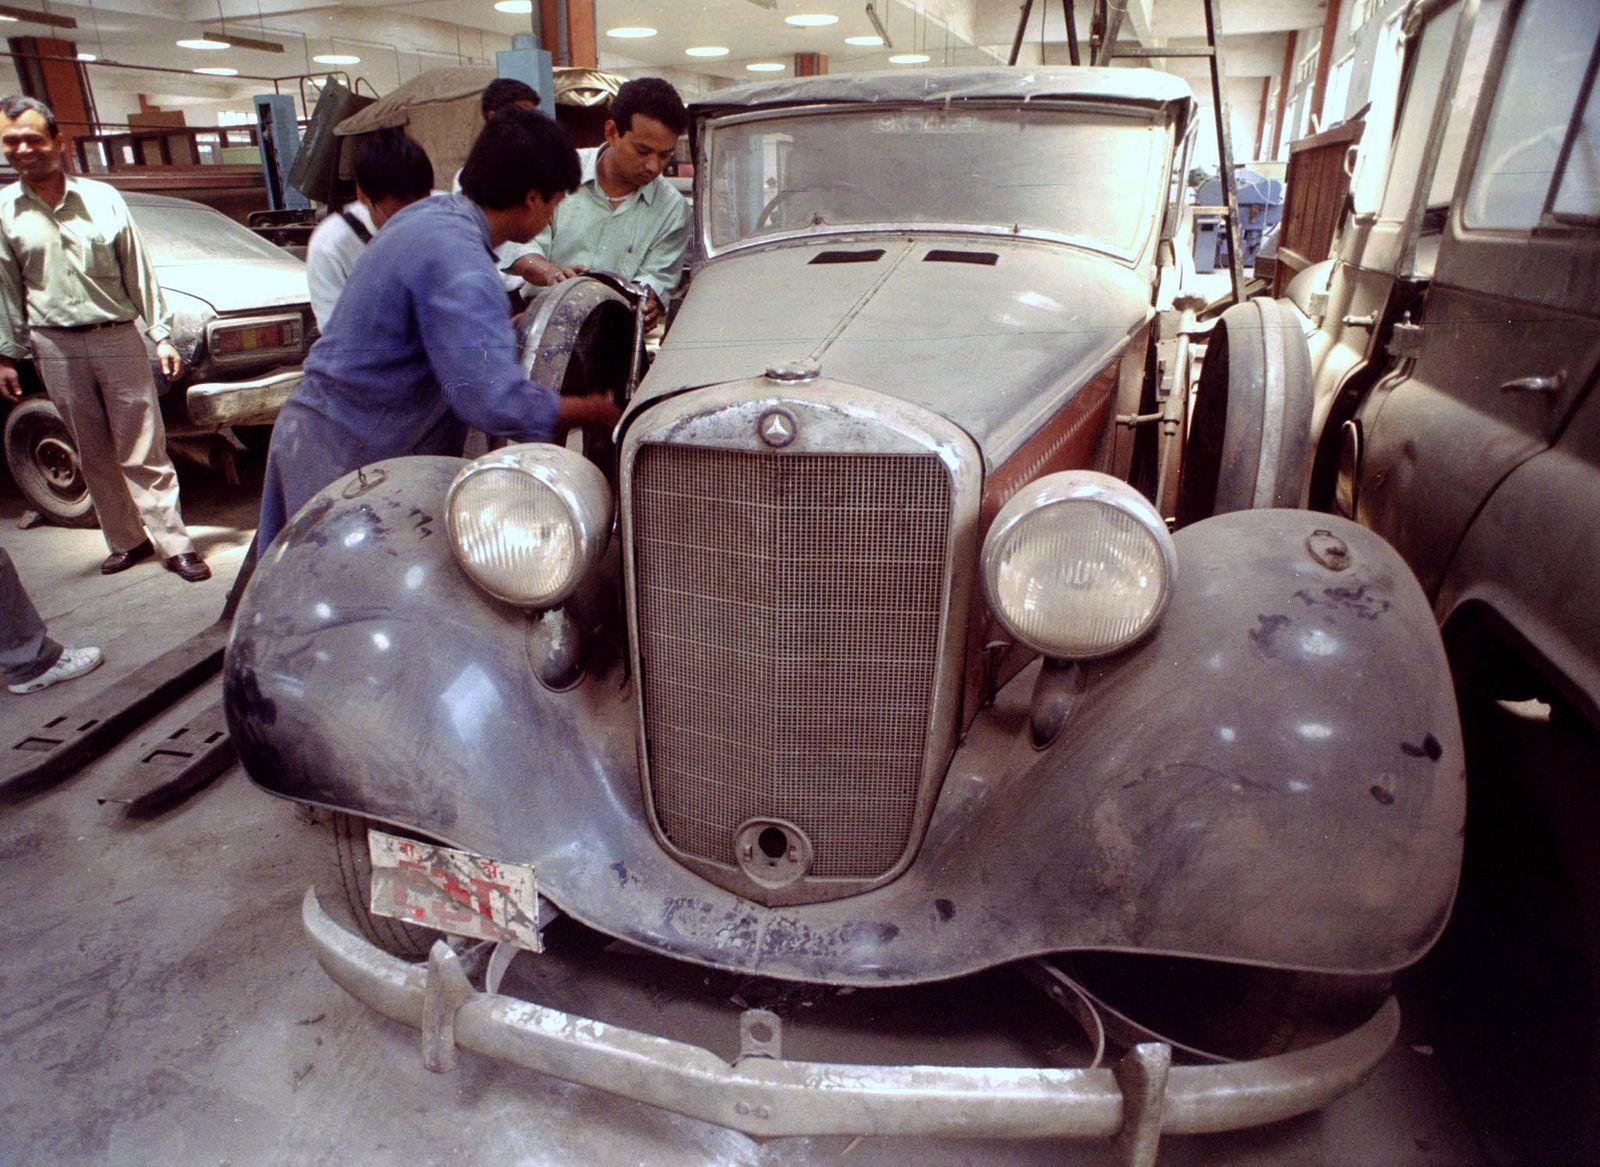 EINMALIGE VERWENDUNG Mercedes in Nepal - OLD DAIMLER-BENZ, PRESENTED BY HITLER, IN NEPAL.